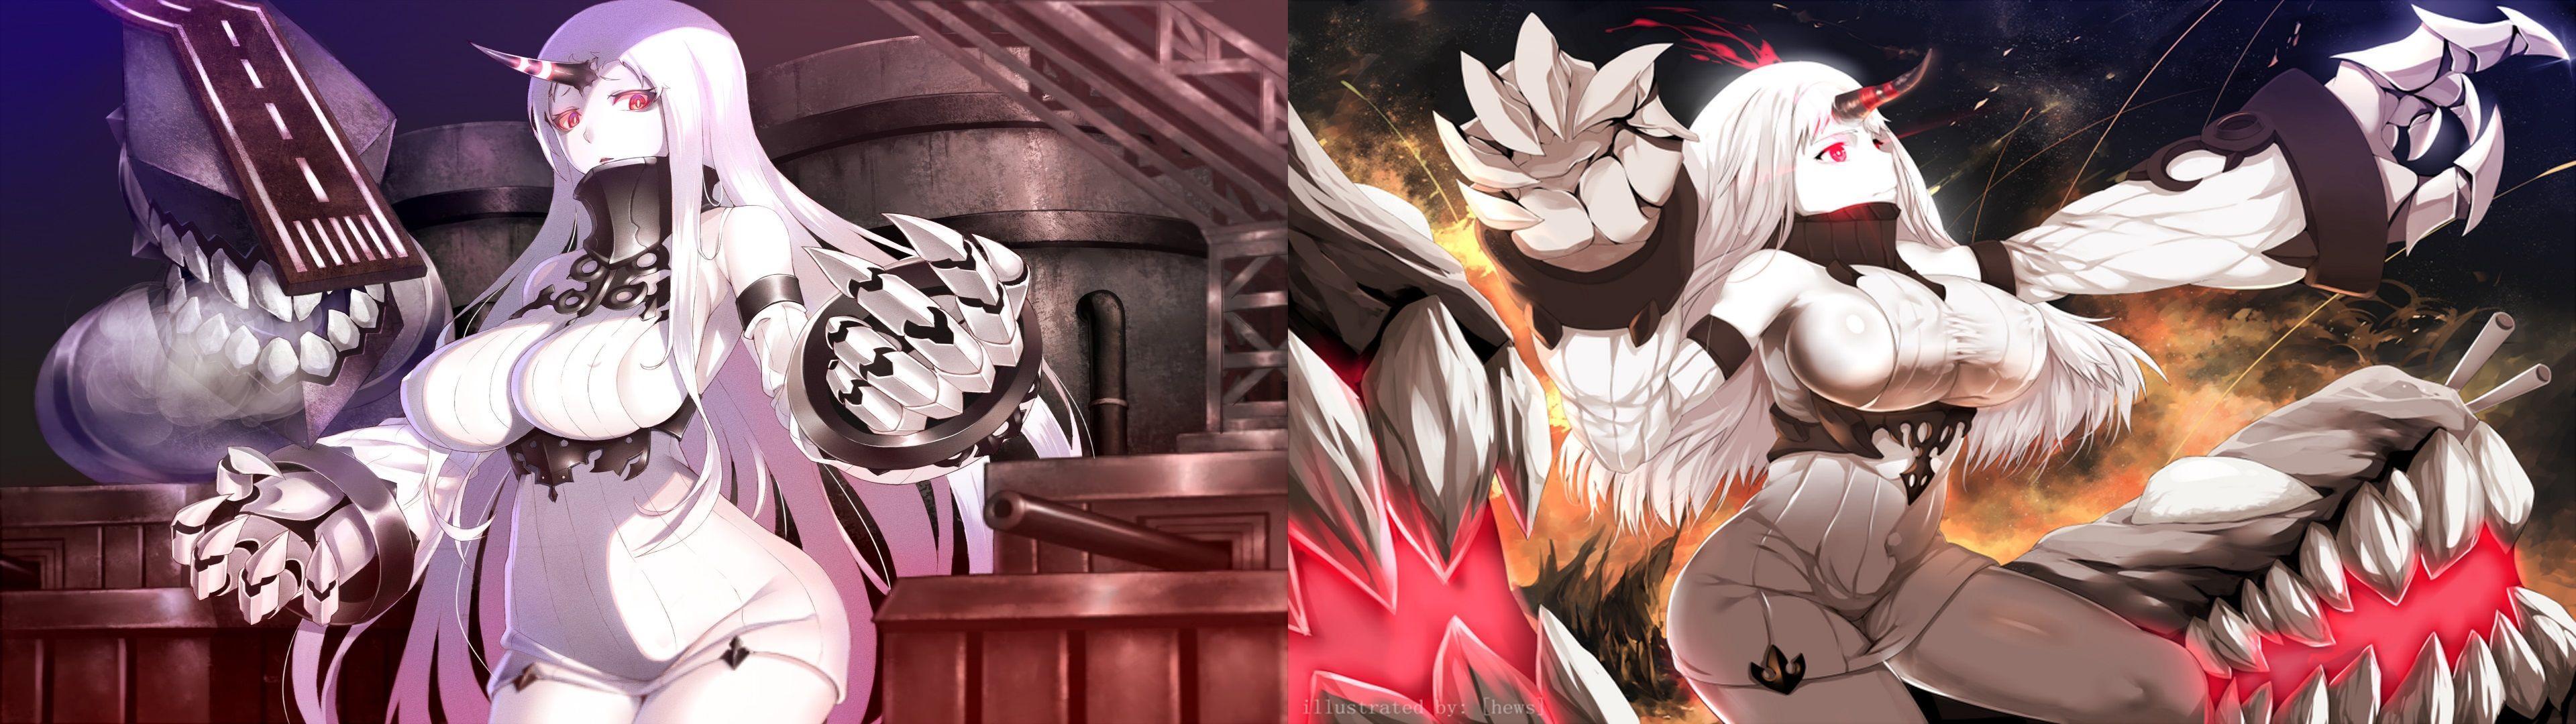 Dual Monitor Anime Wallpapers - Top Free Dual Monitor ...